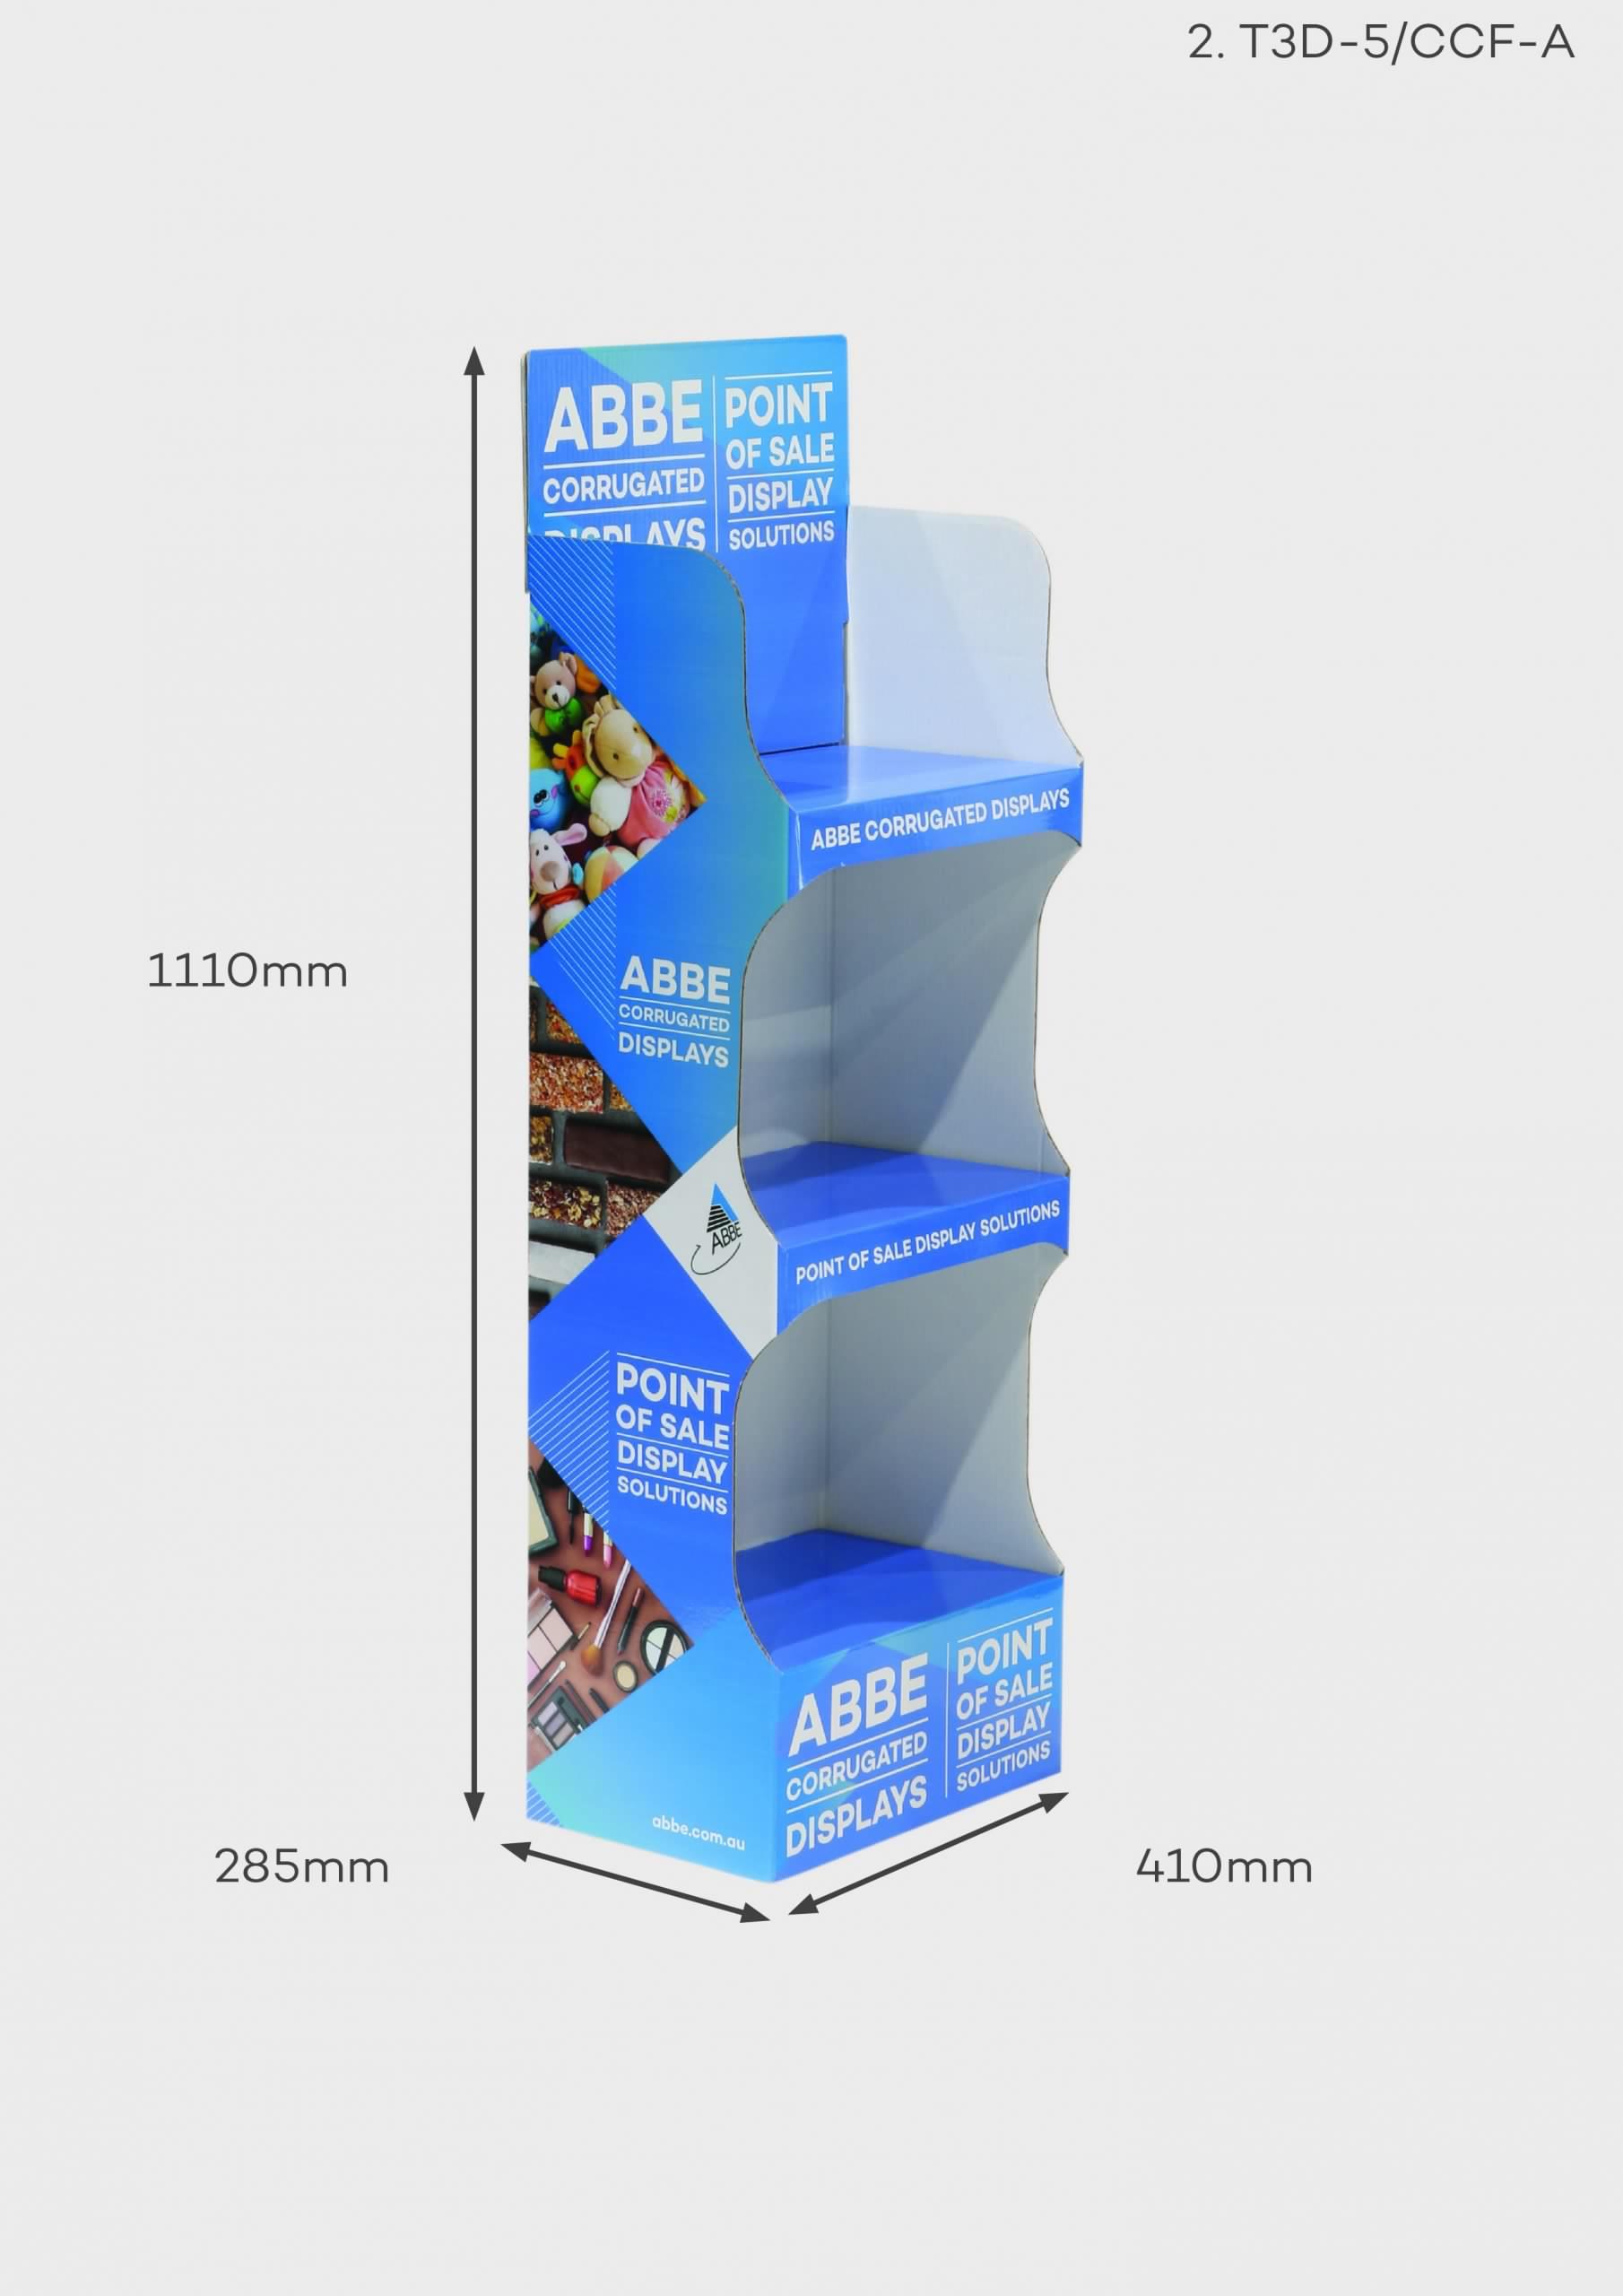 3 Shelf Display (Ref T3D-5/CCF-A)